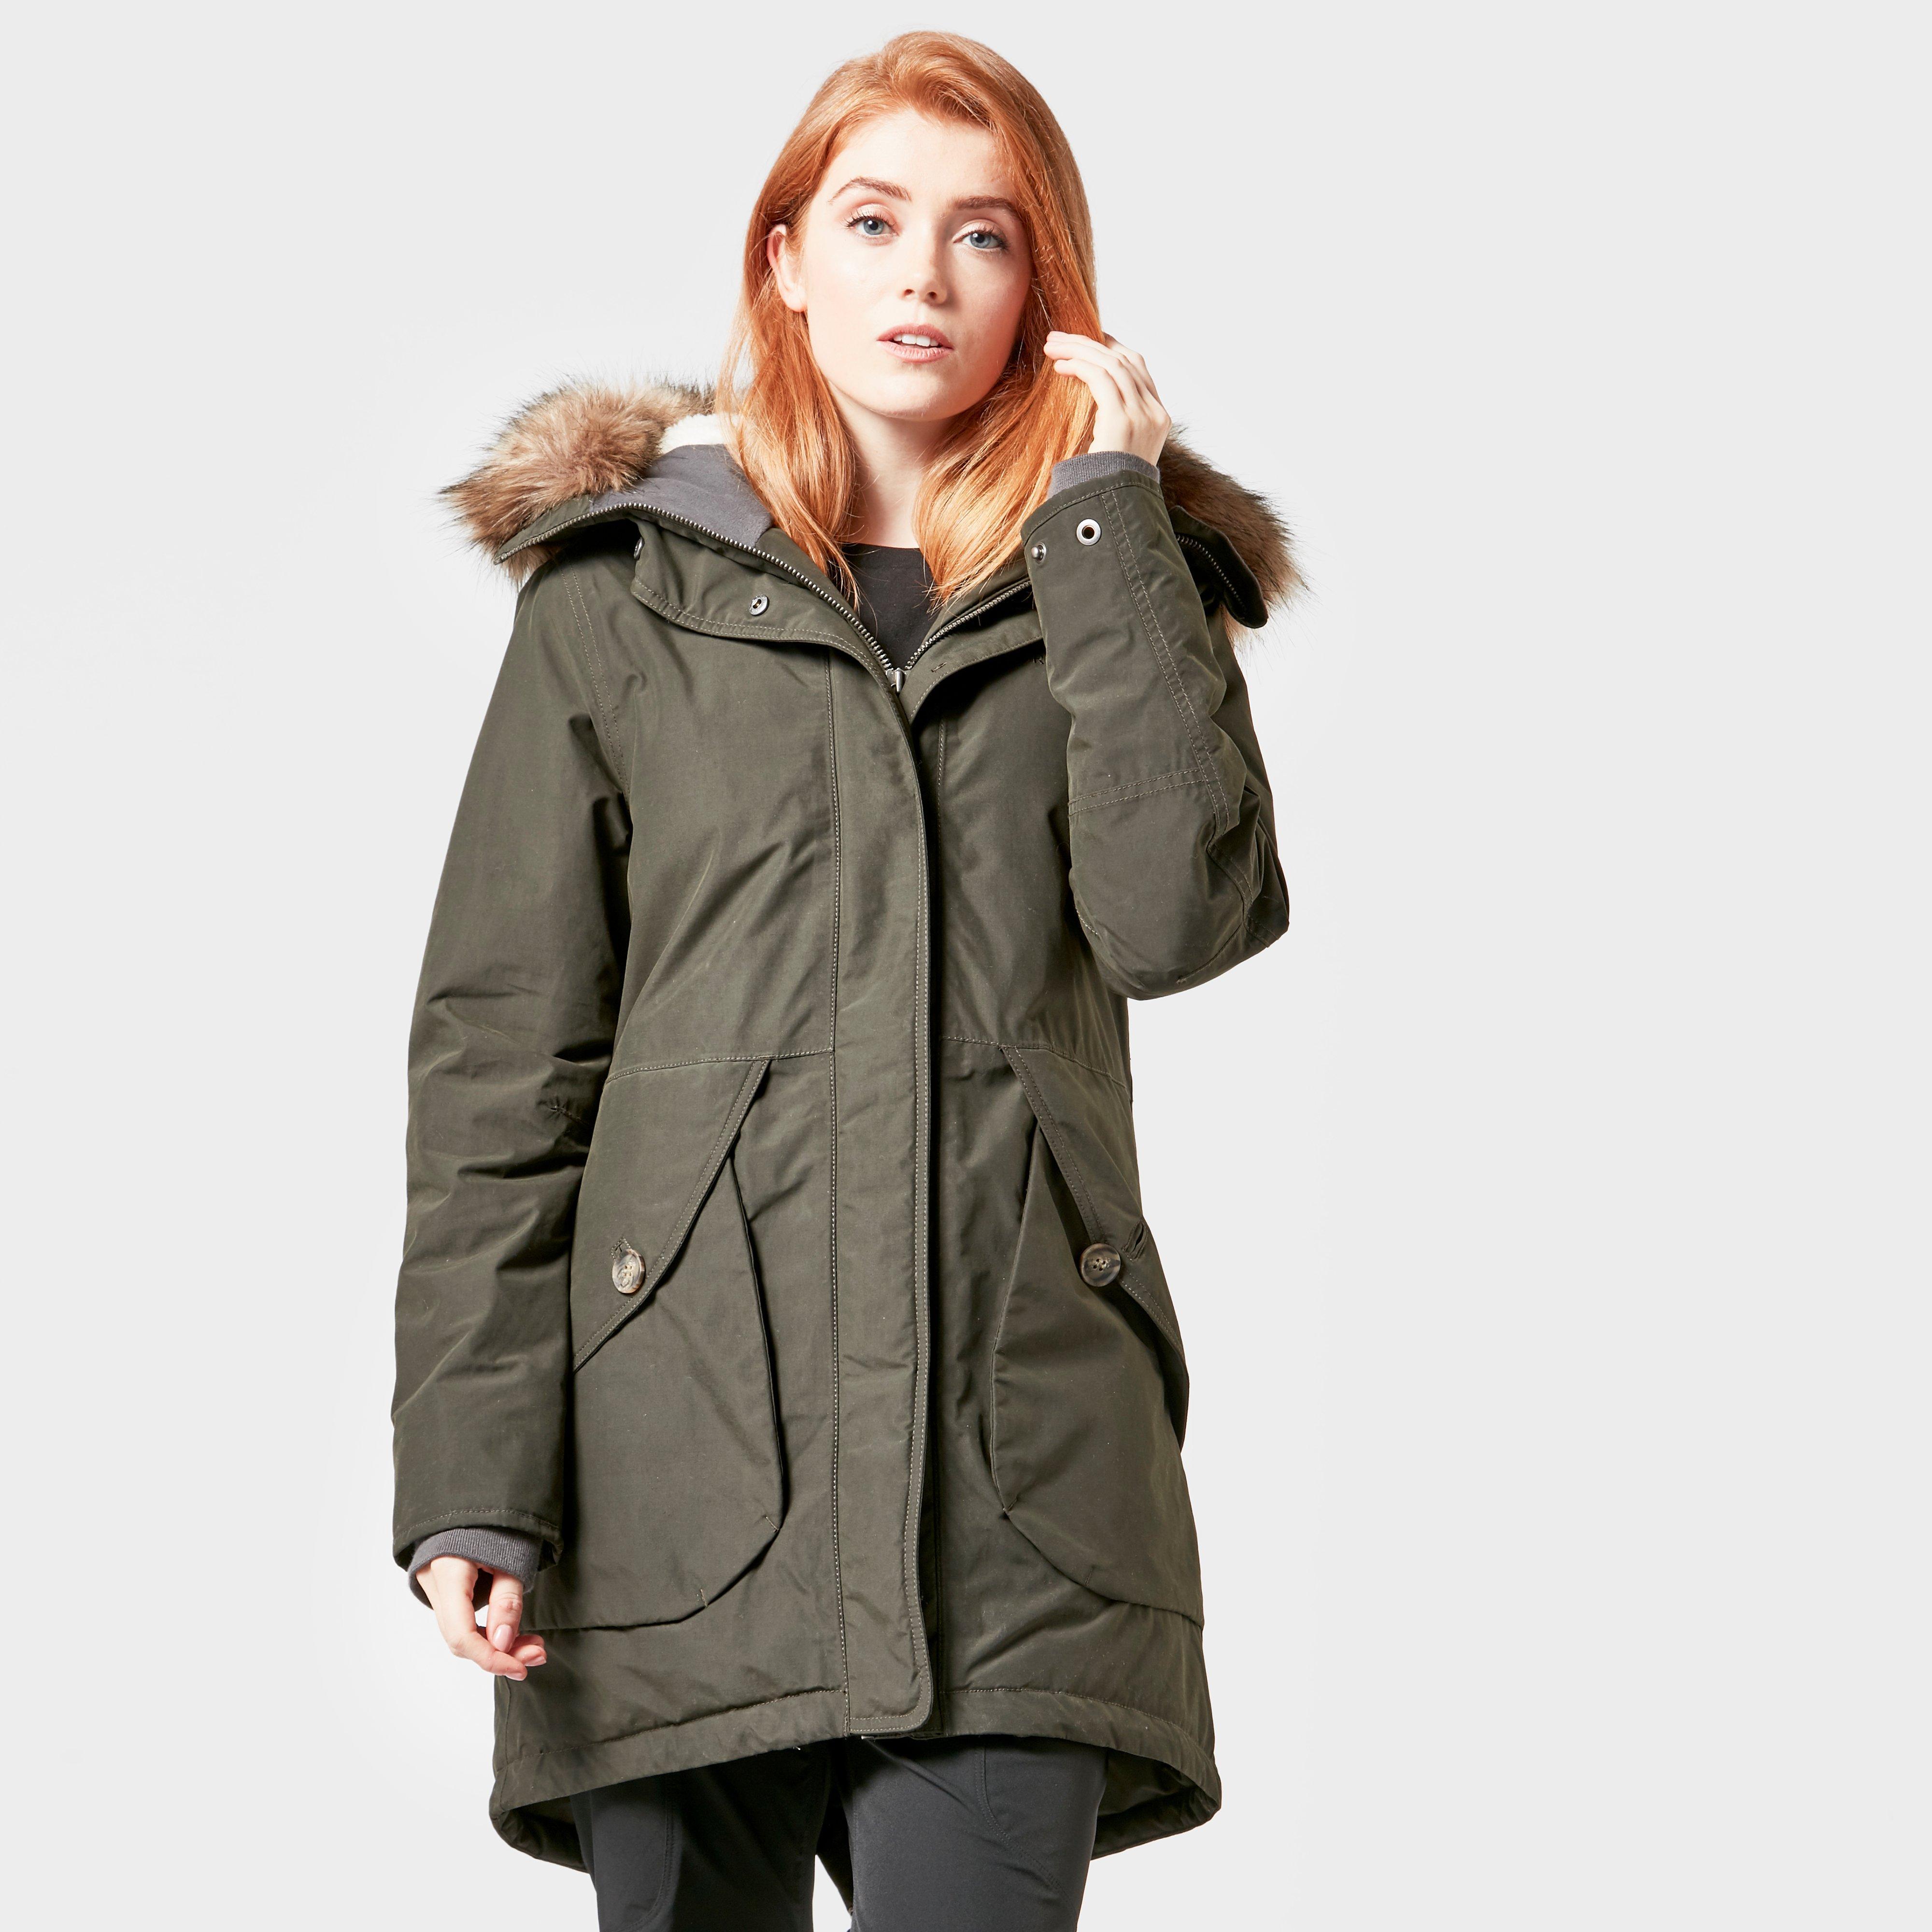 Didriksons Women's Angela Coat, Khaki